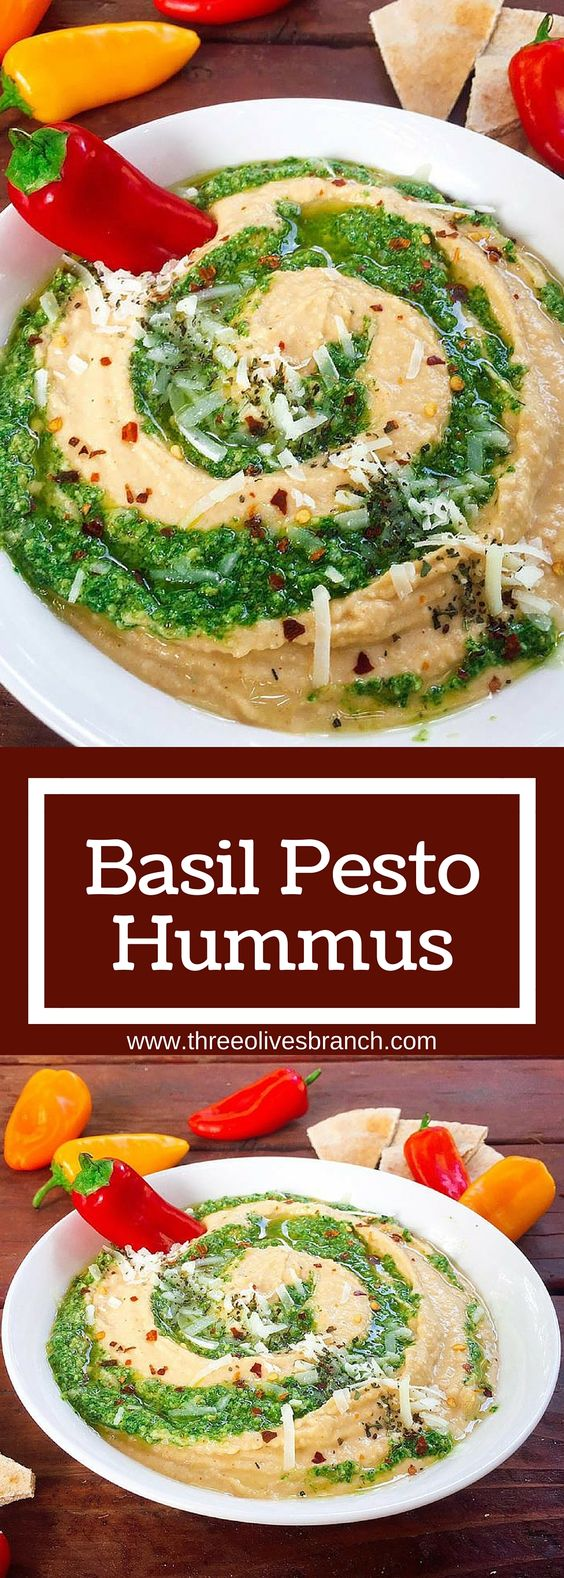 Traditional, Basil pesto and Pesto hummus on Pinterest